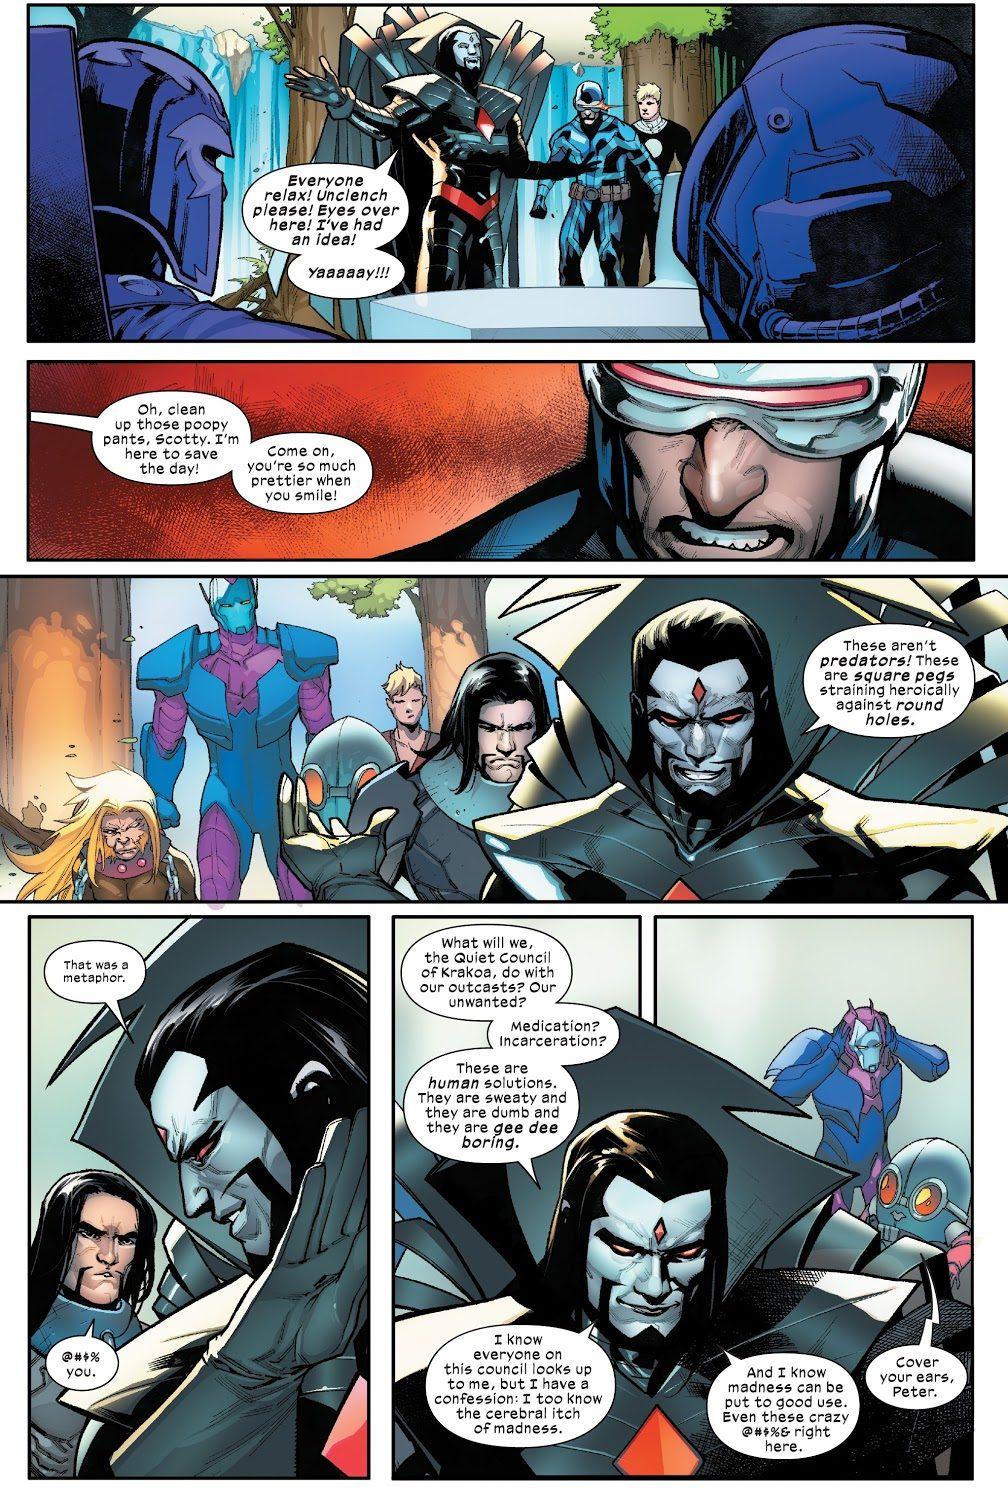 Mister Sinister Creates The Hellions